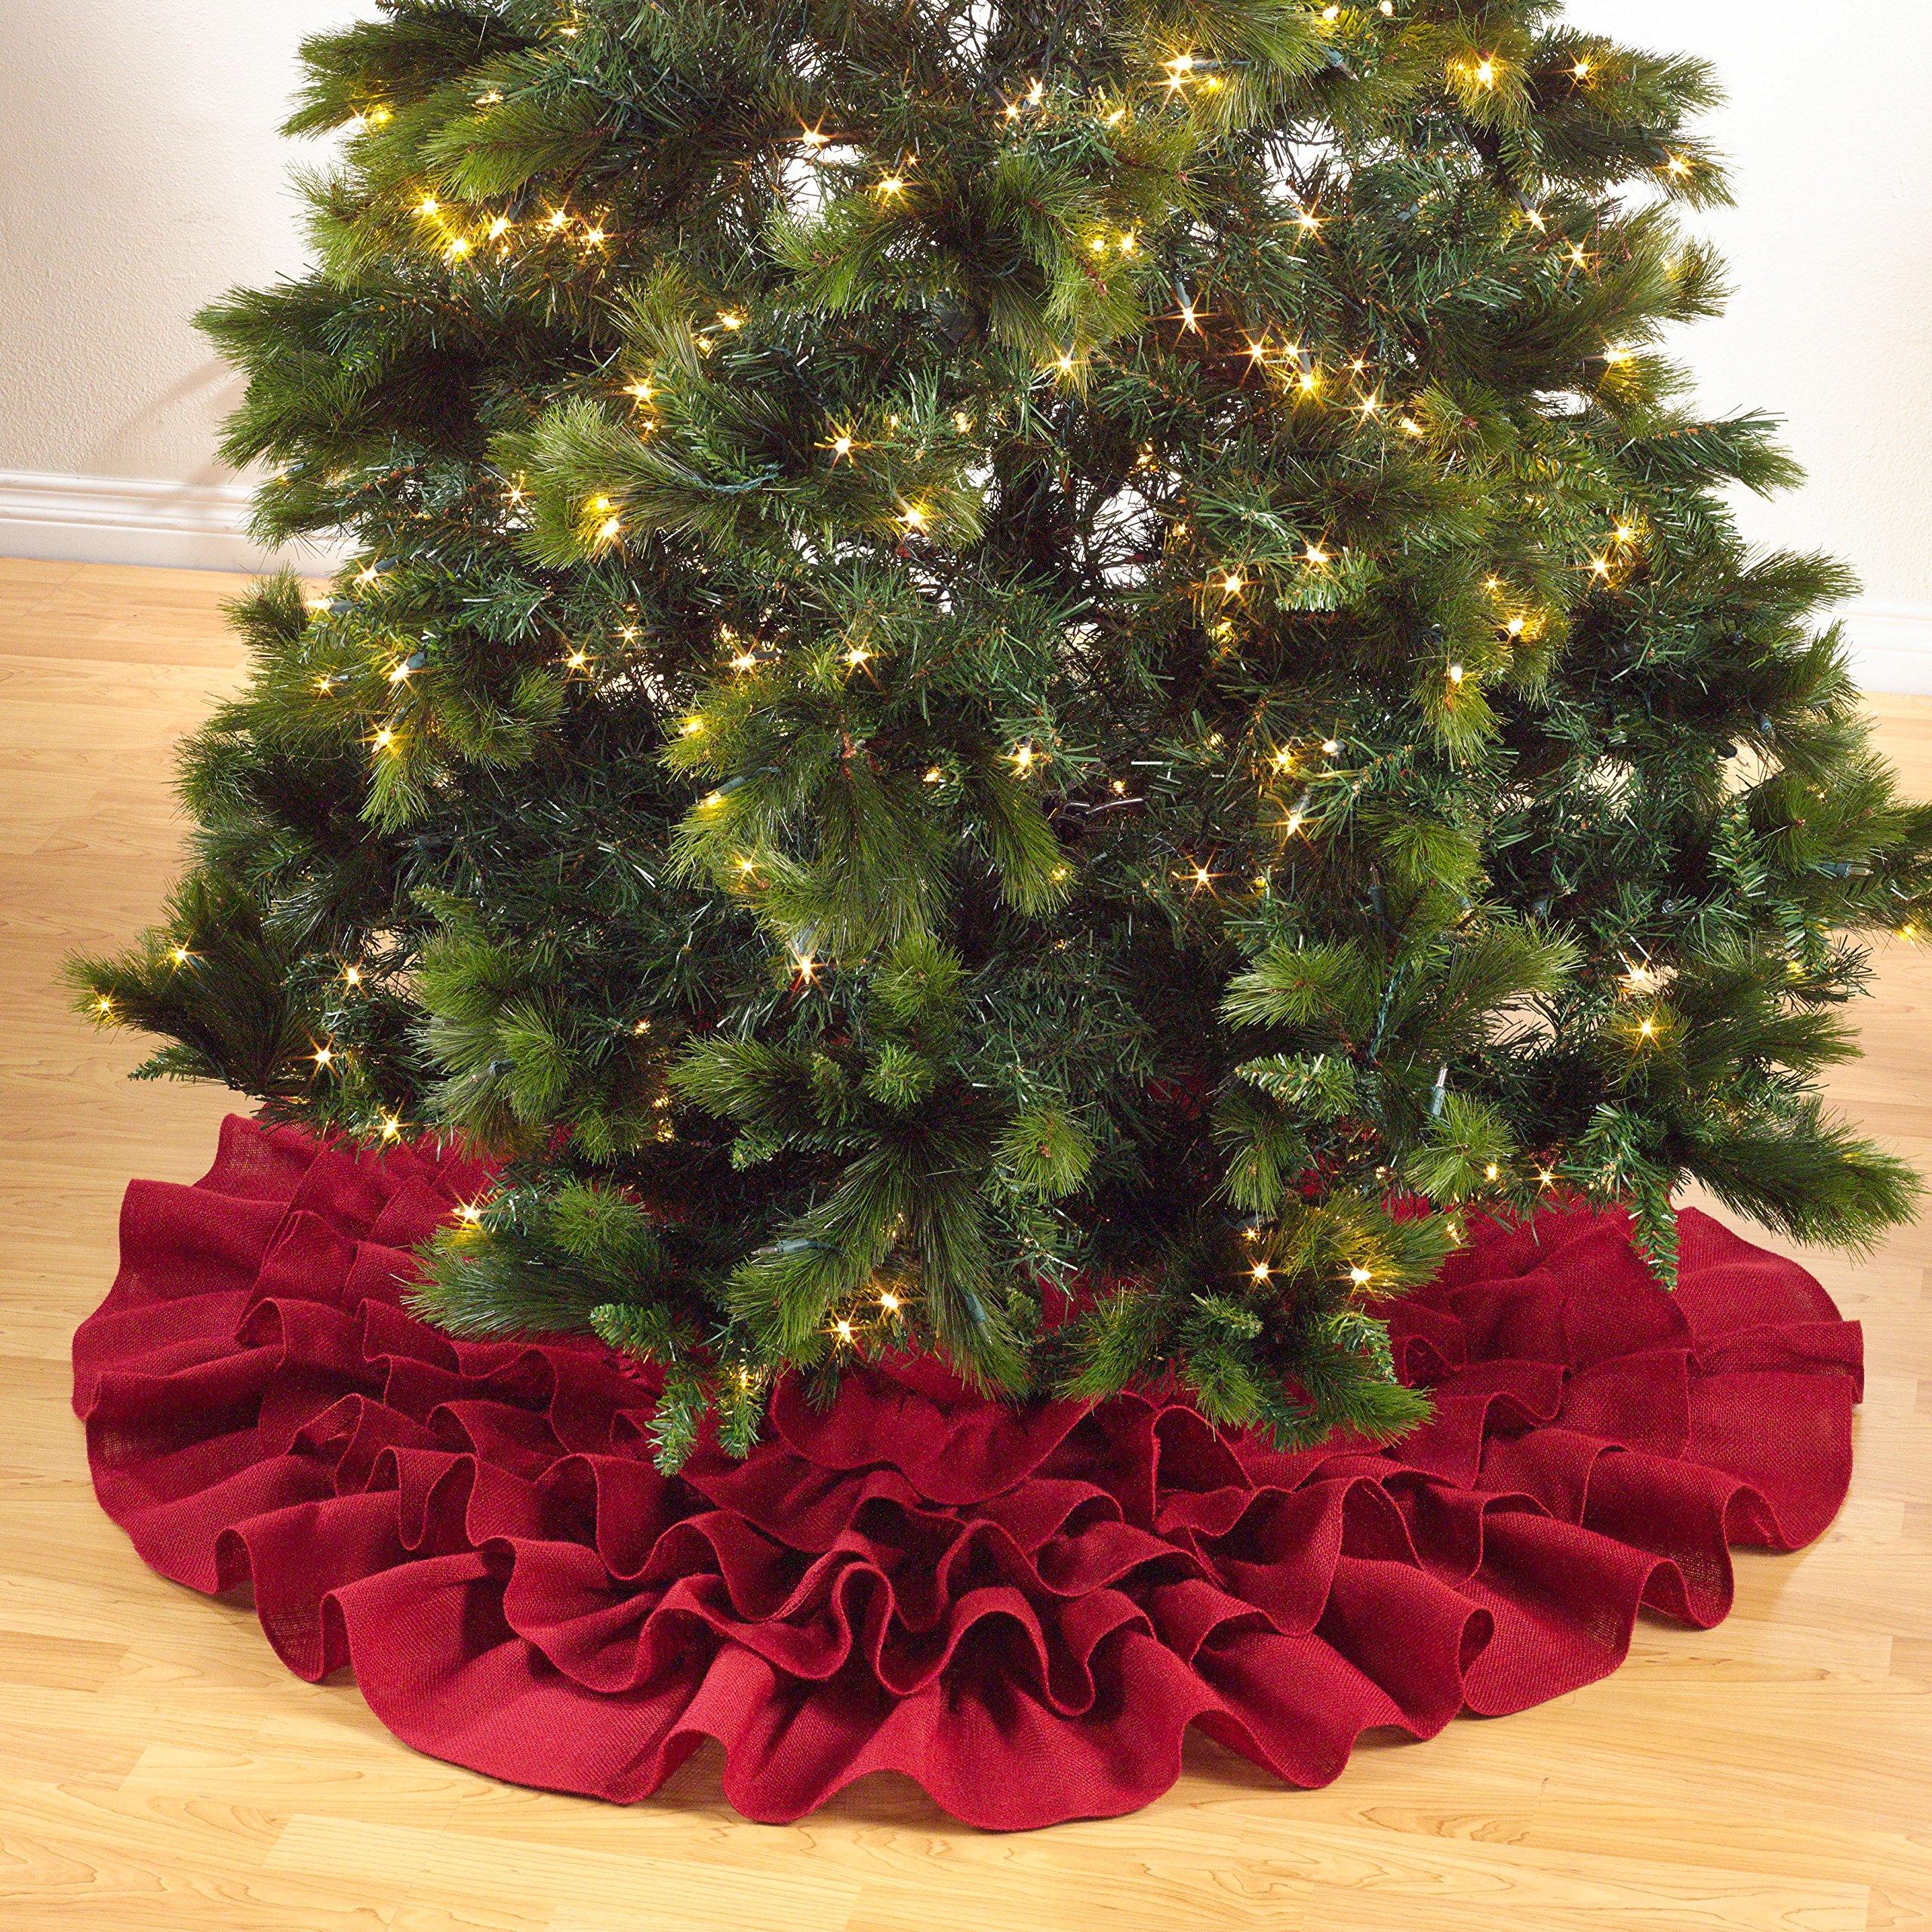 SARO LIFESTYLE 0516.R56R Ruffled Design Jute Tree Skirt, Red, 56''